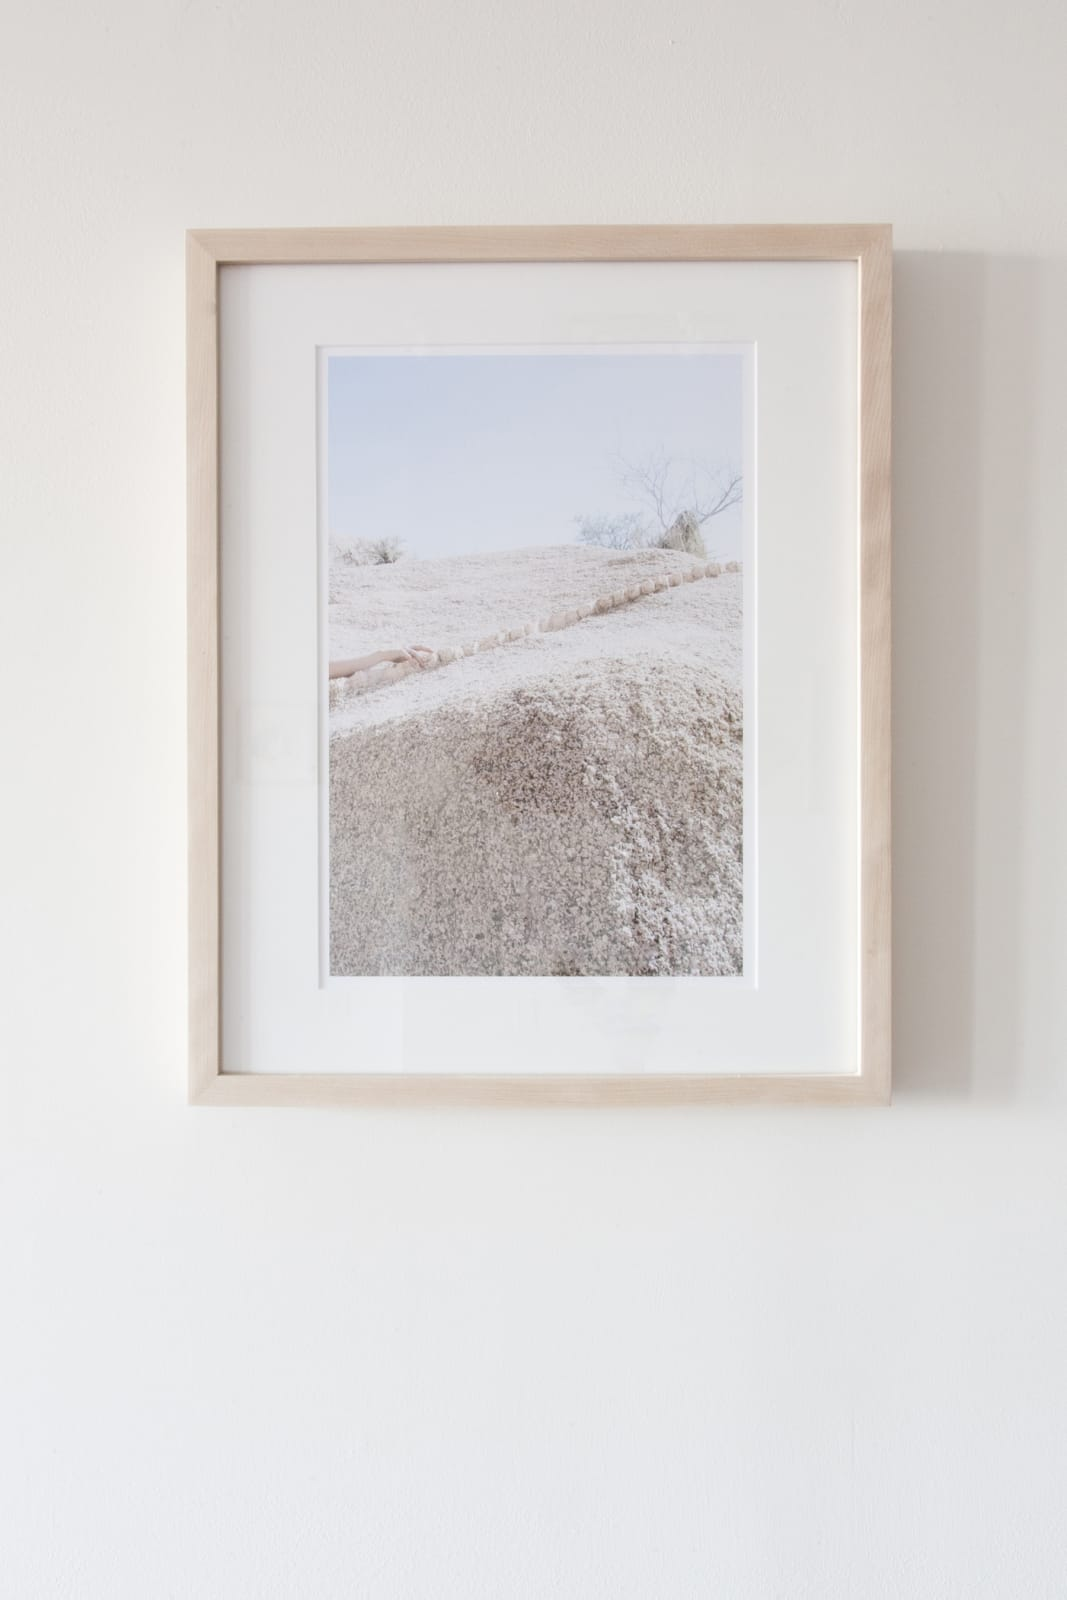 Grace Clark Jumo Rocks I, 2017 digital pigment print print size 15 x 10 inches, 20 x 16 framed, edition 1/10 edition 1/10 $ 650.00